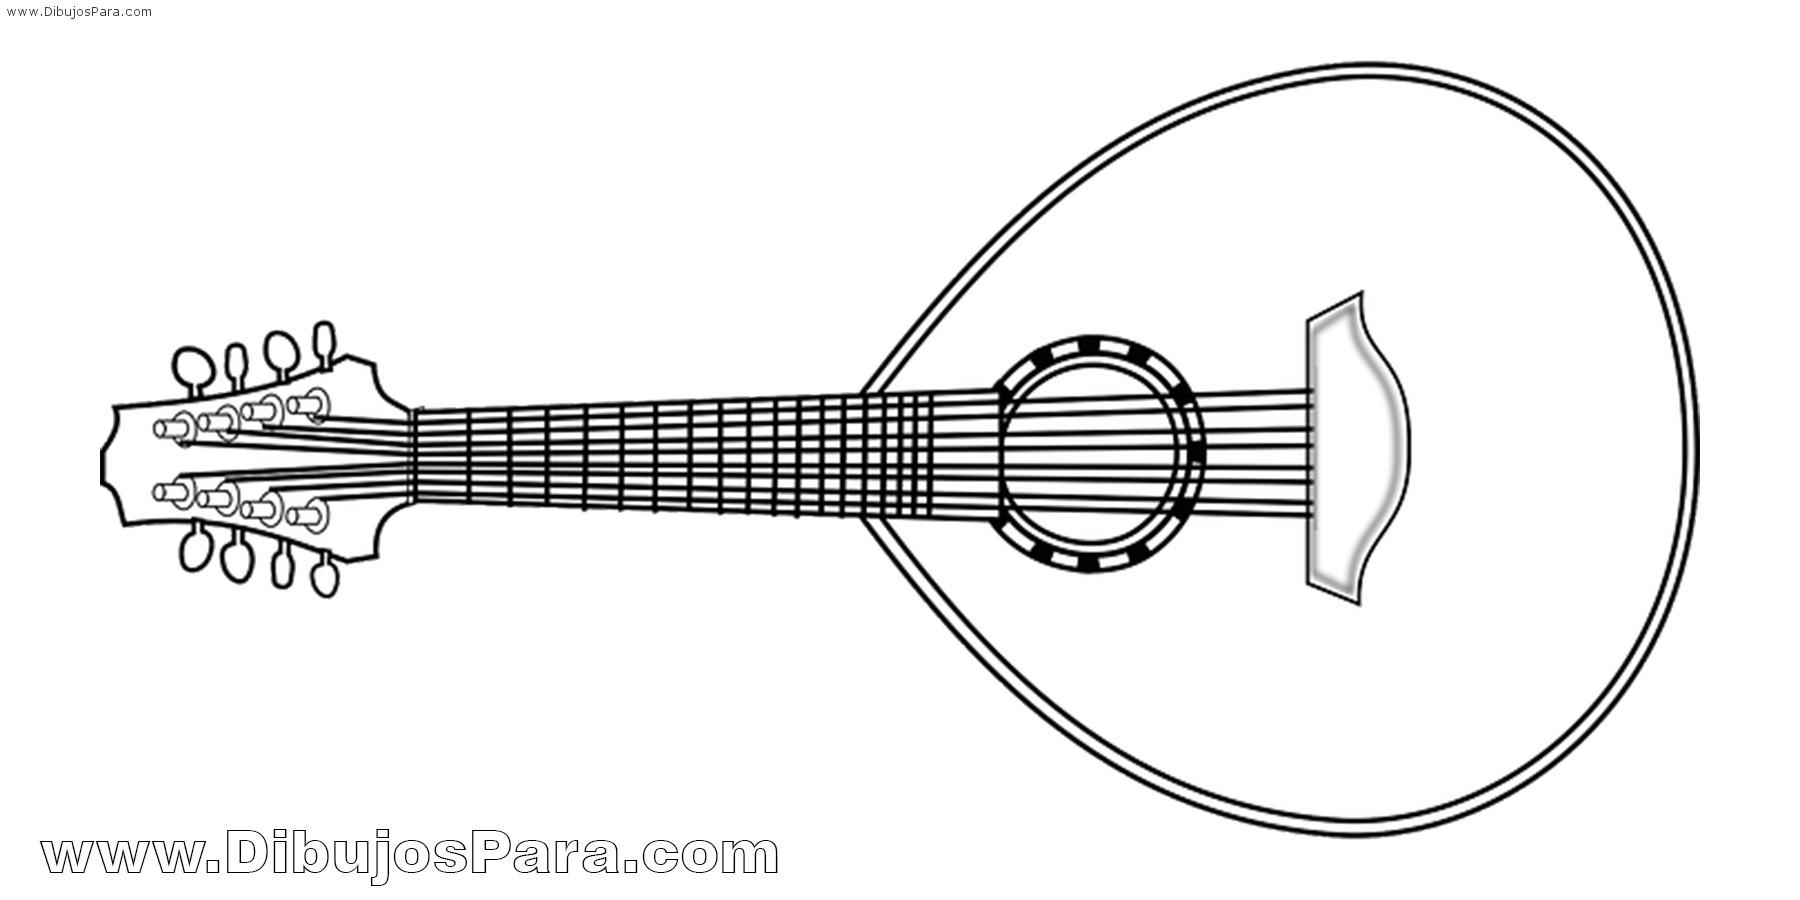 Dibujo de Laúd | Dibujos de Instrumentos para Pintar | Dibujos para ...